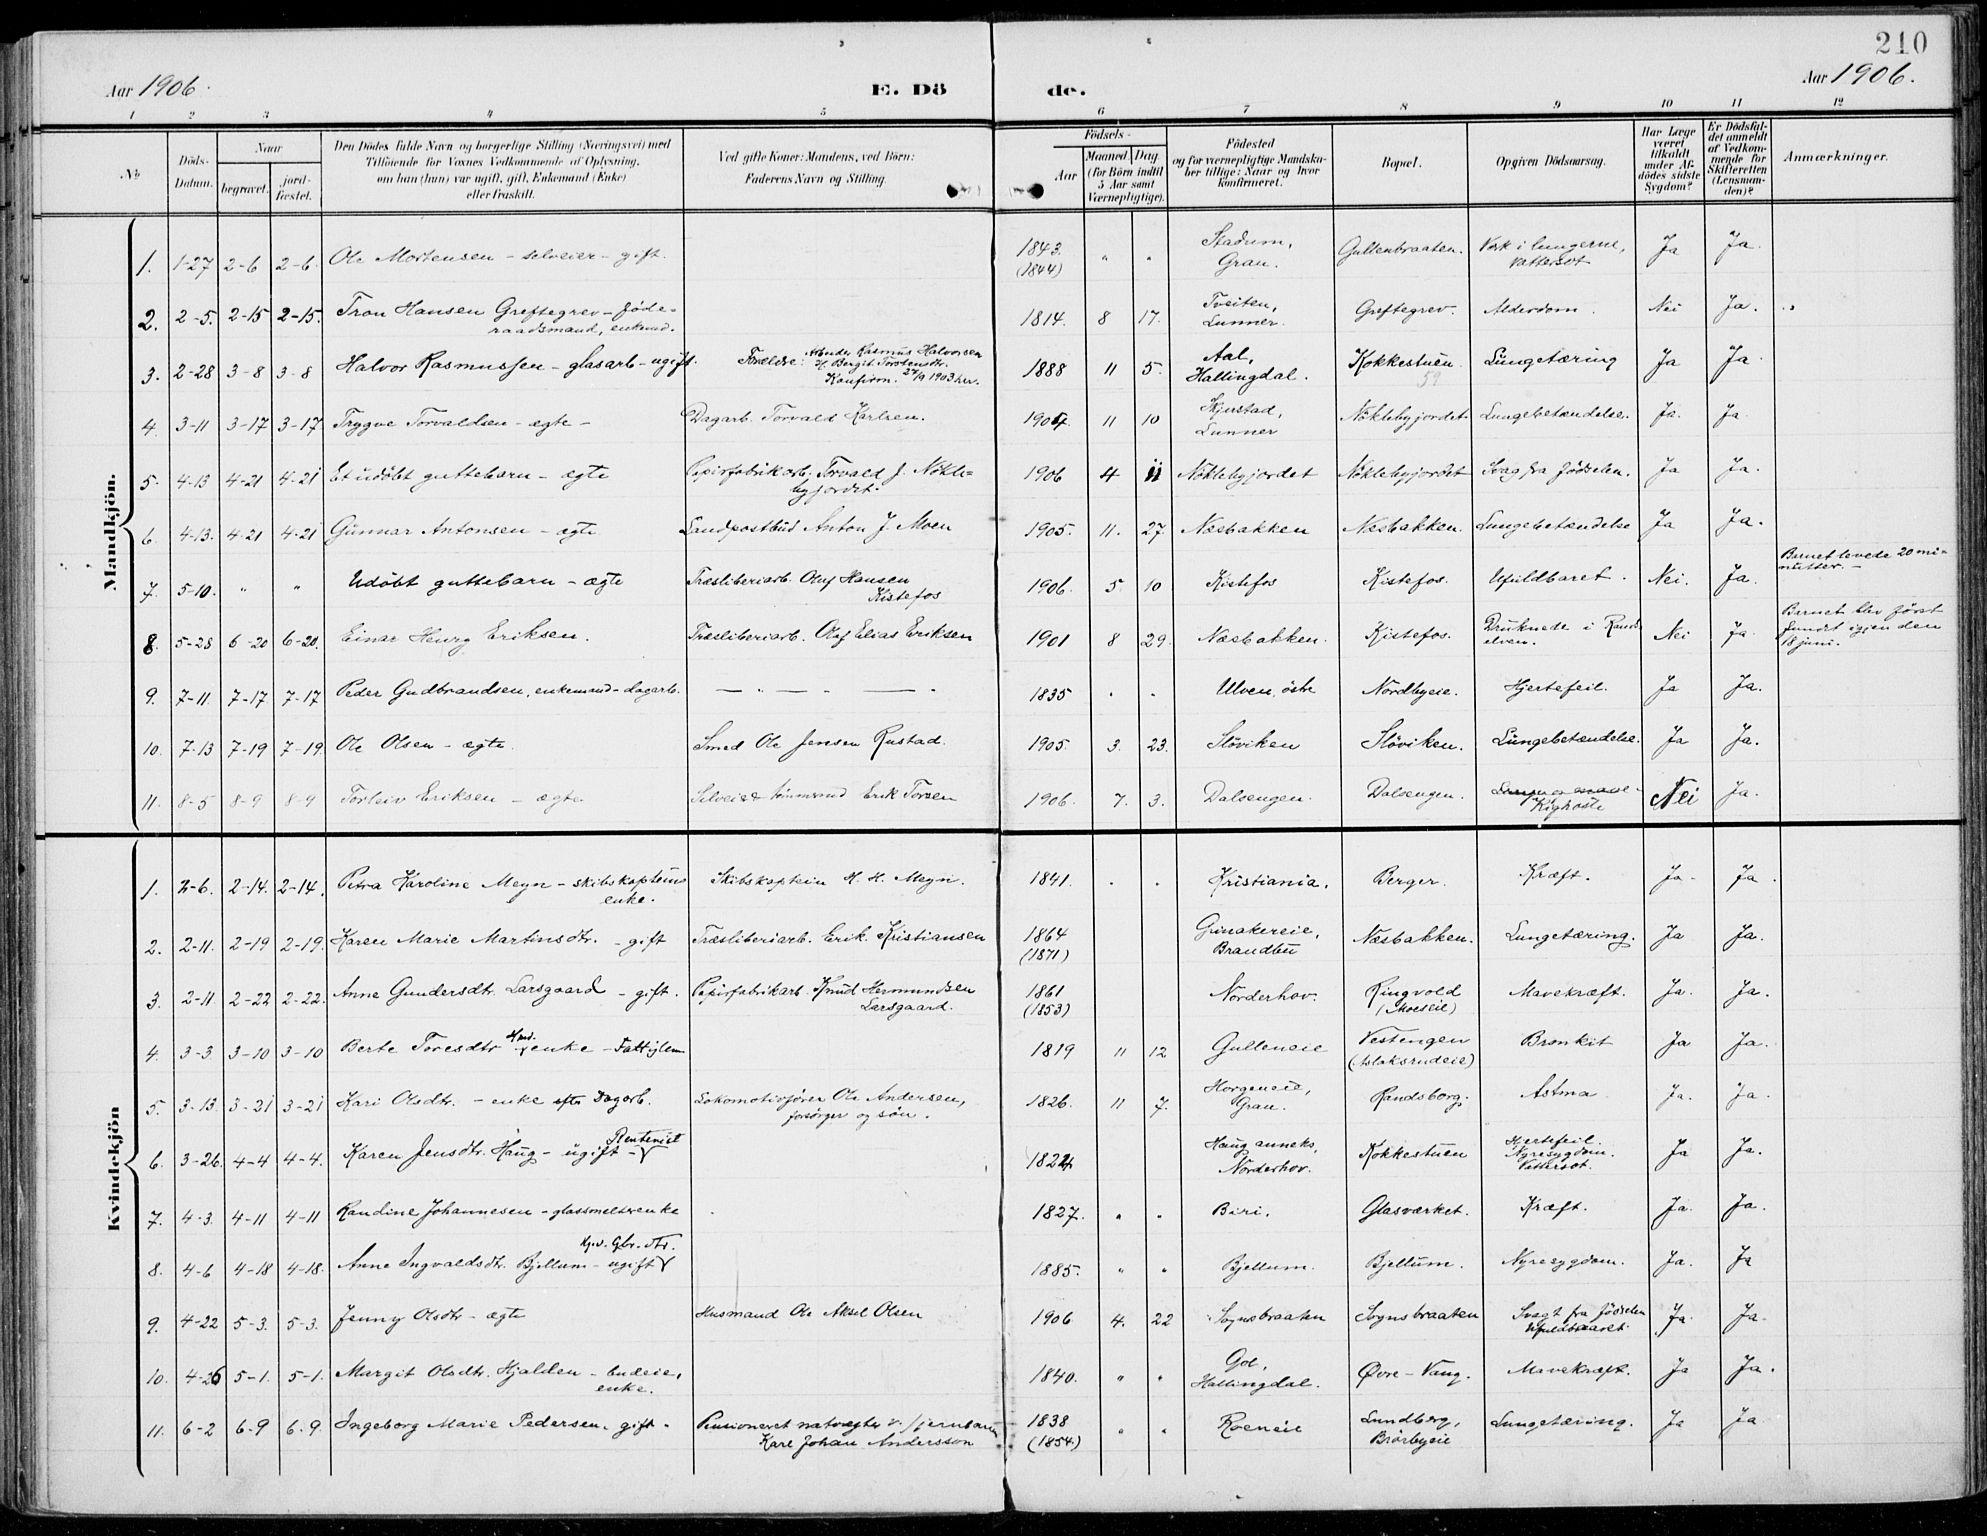 SAH, Jevnaker prestekontor, Ministerialbok nr. 11, 1902-1913, s. 210